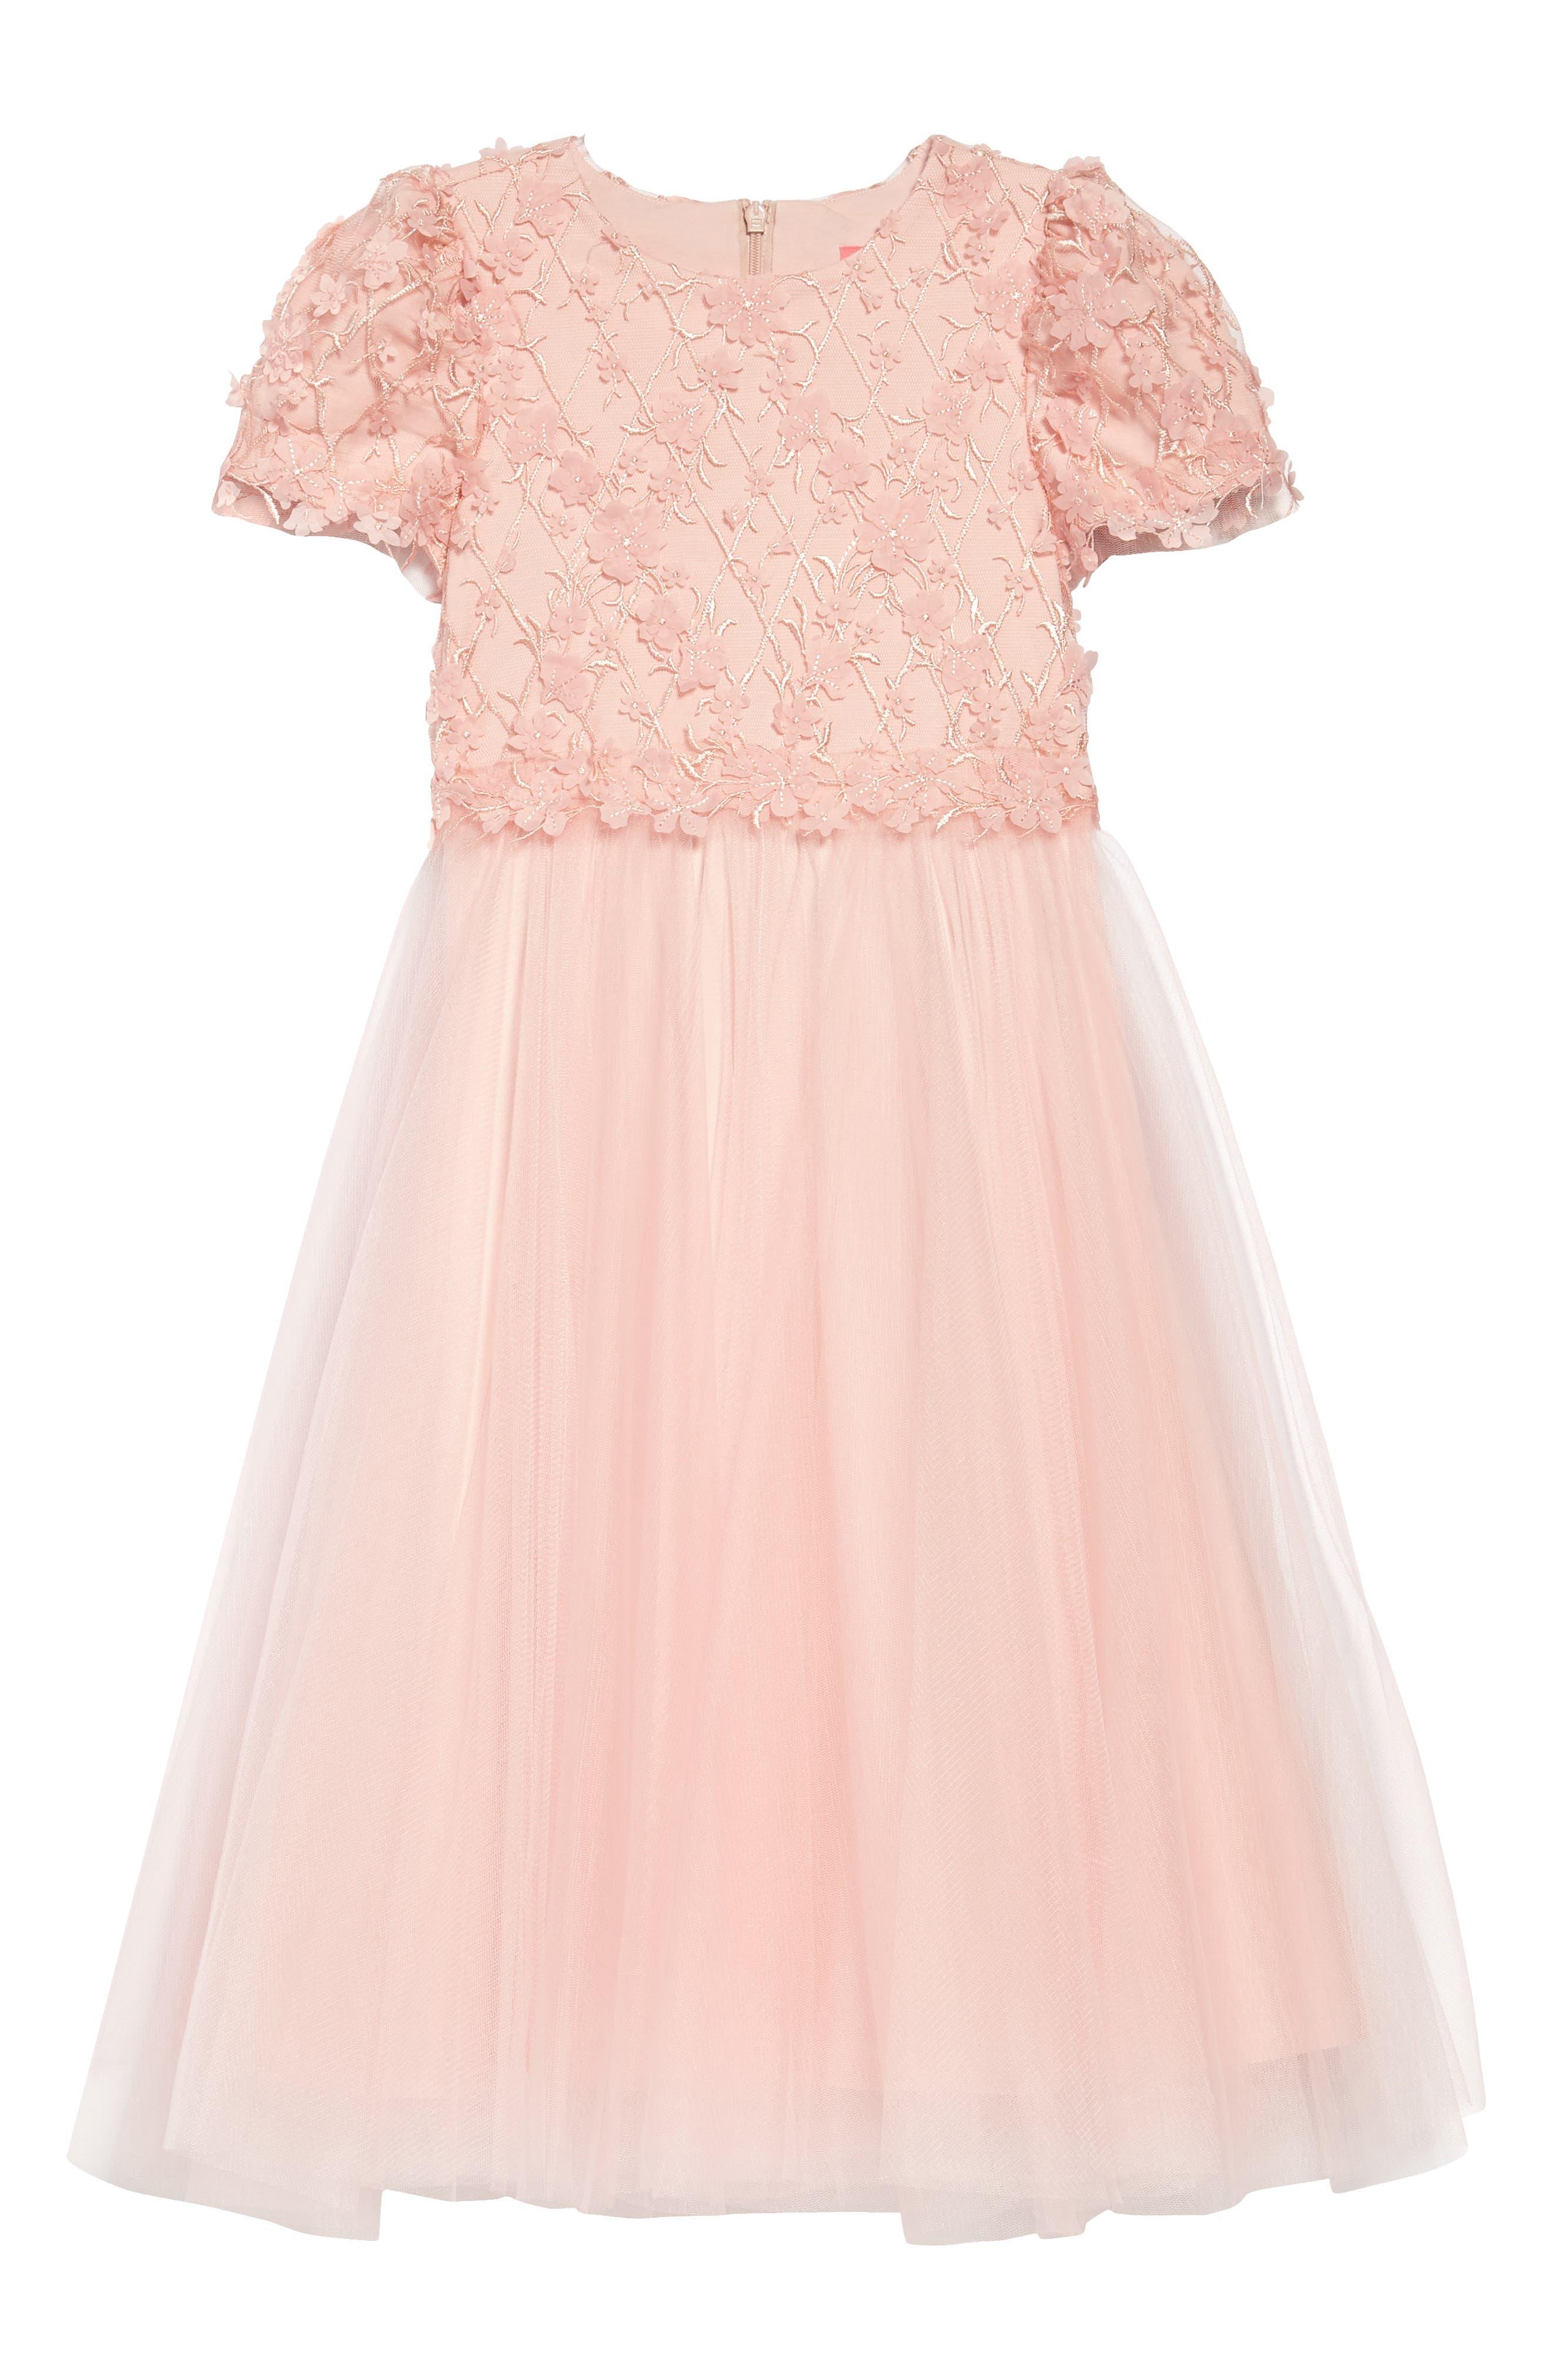 Cap Sleeve Lace Dress,                             Main thumbnail 1, color,                             Rose Quartz